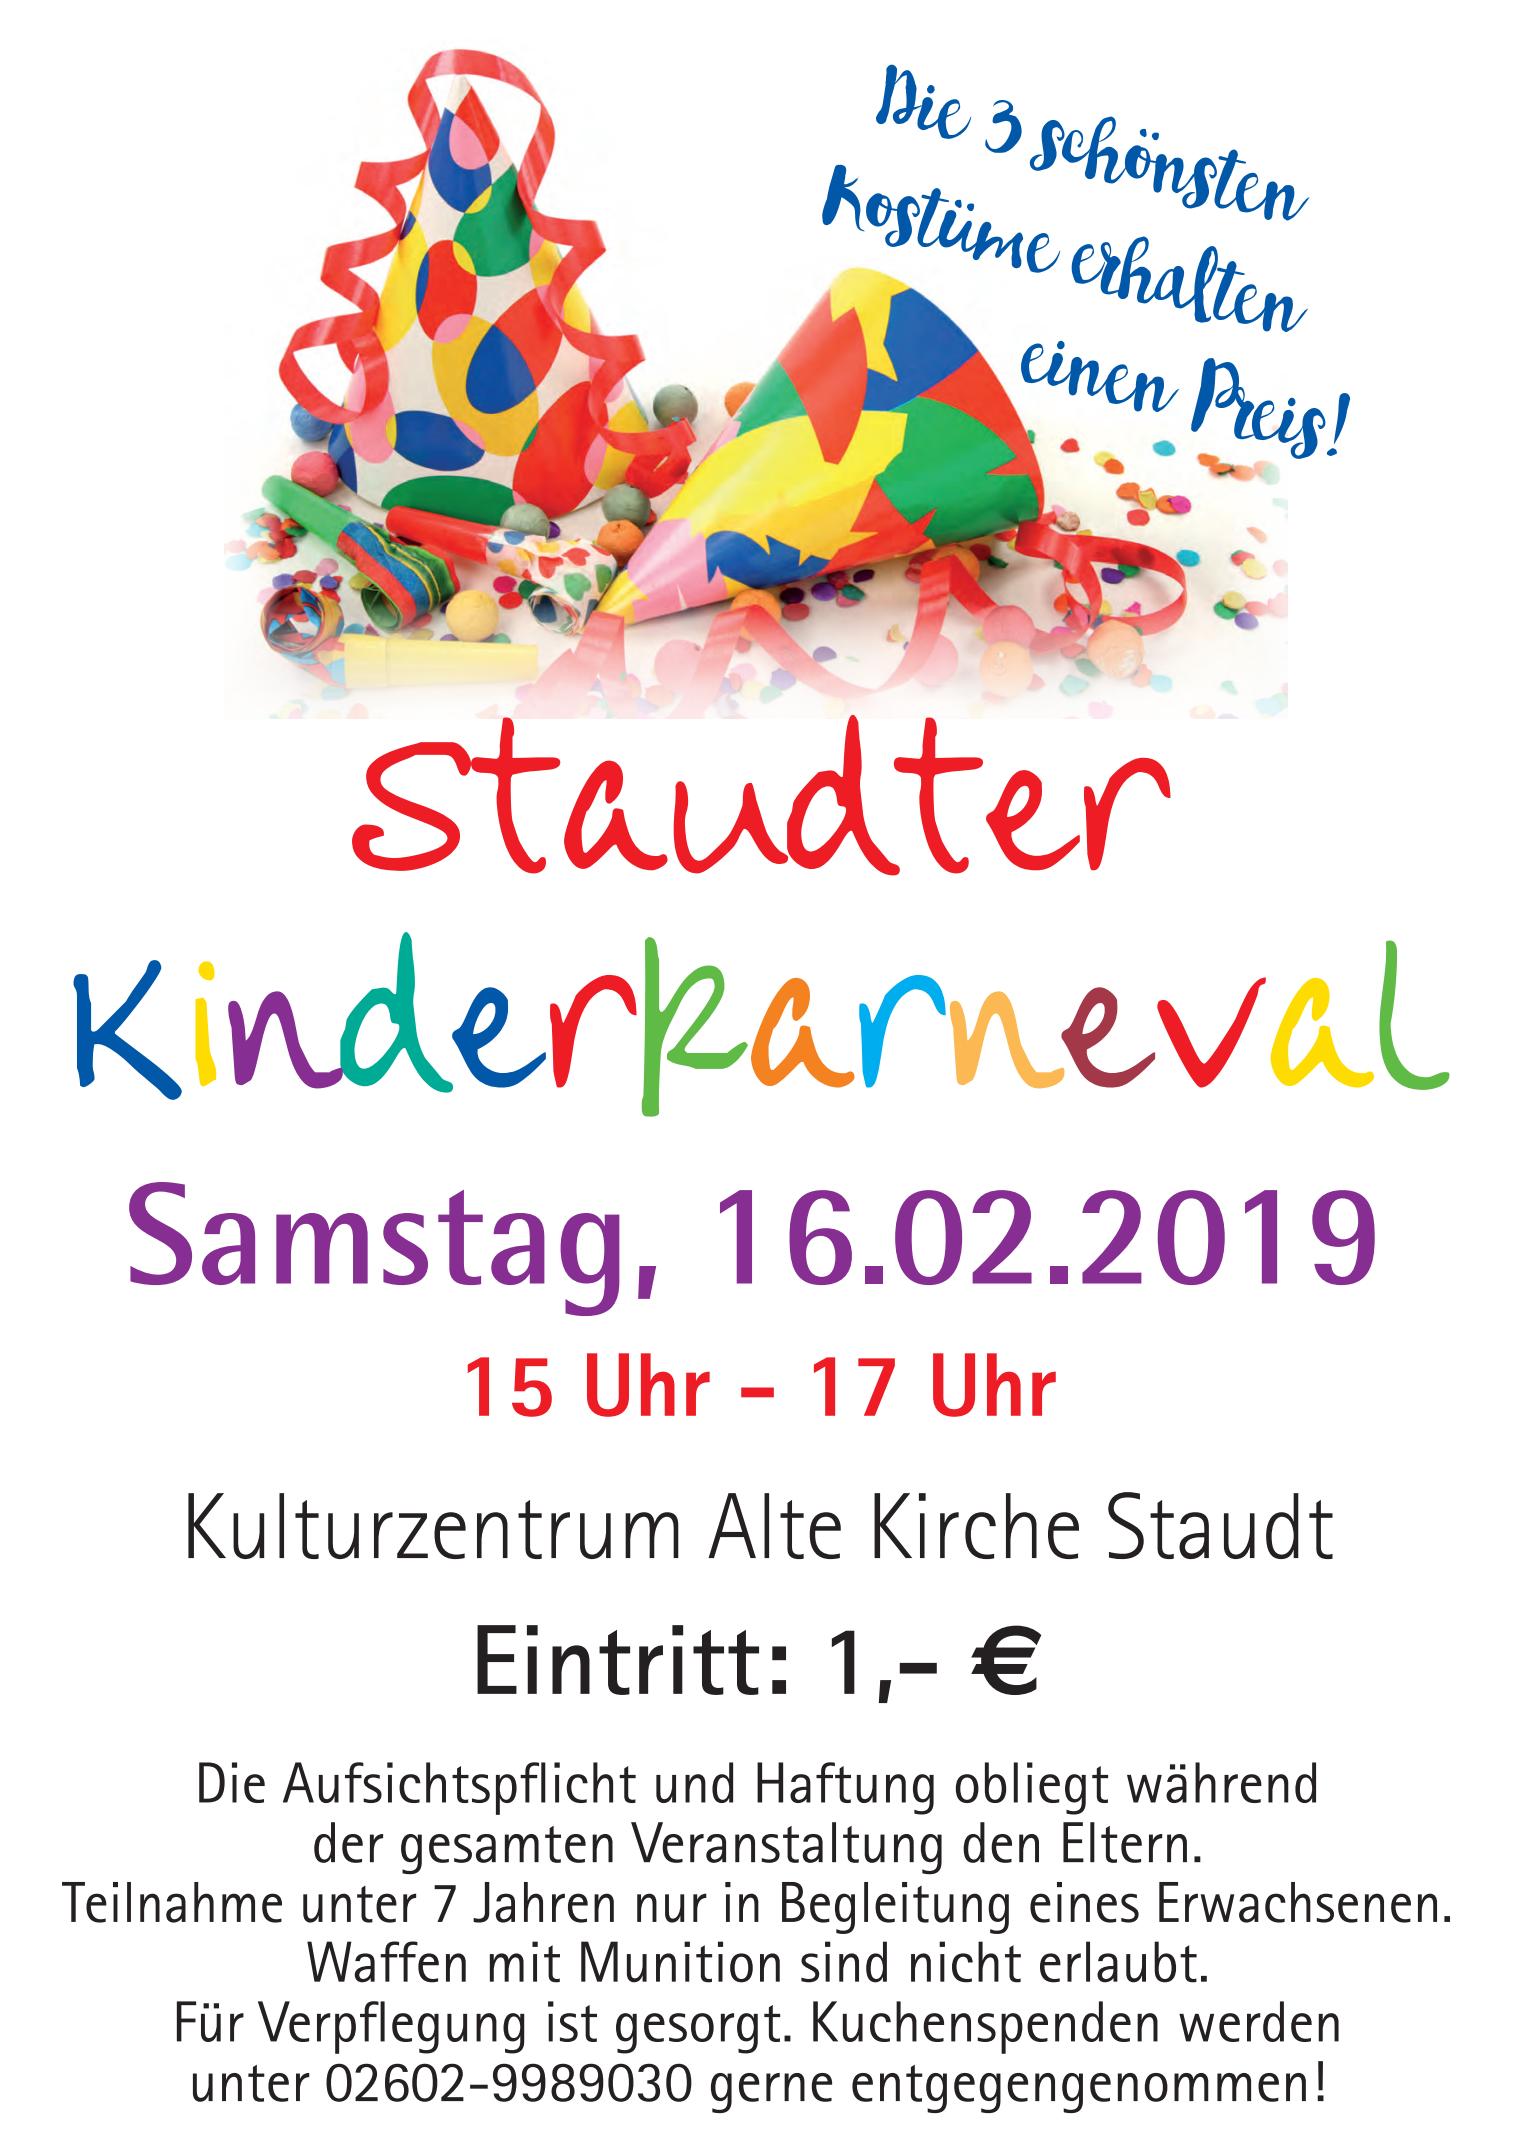 Staudter Kinderkarneval @ Alte Kirche Staudt